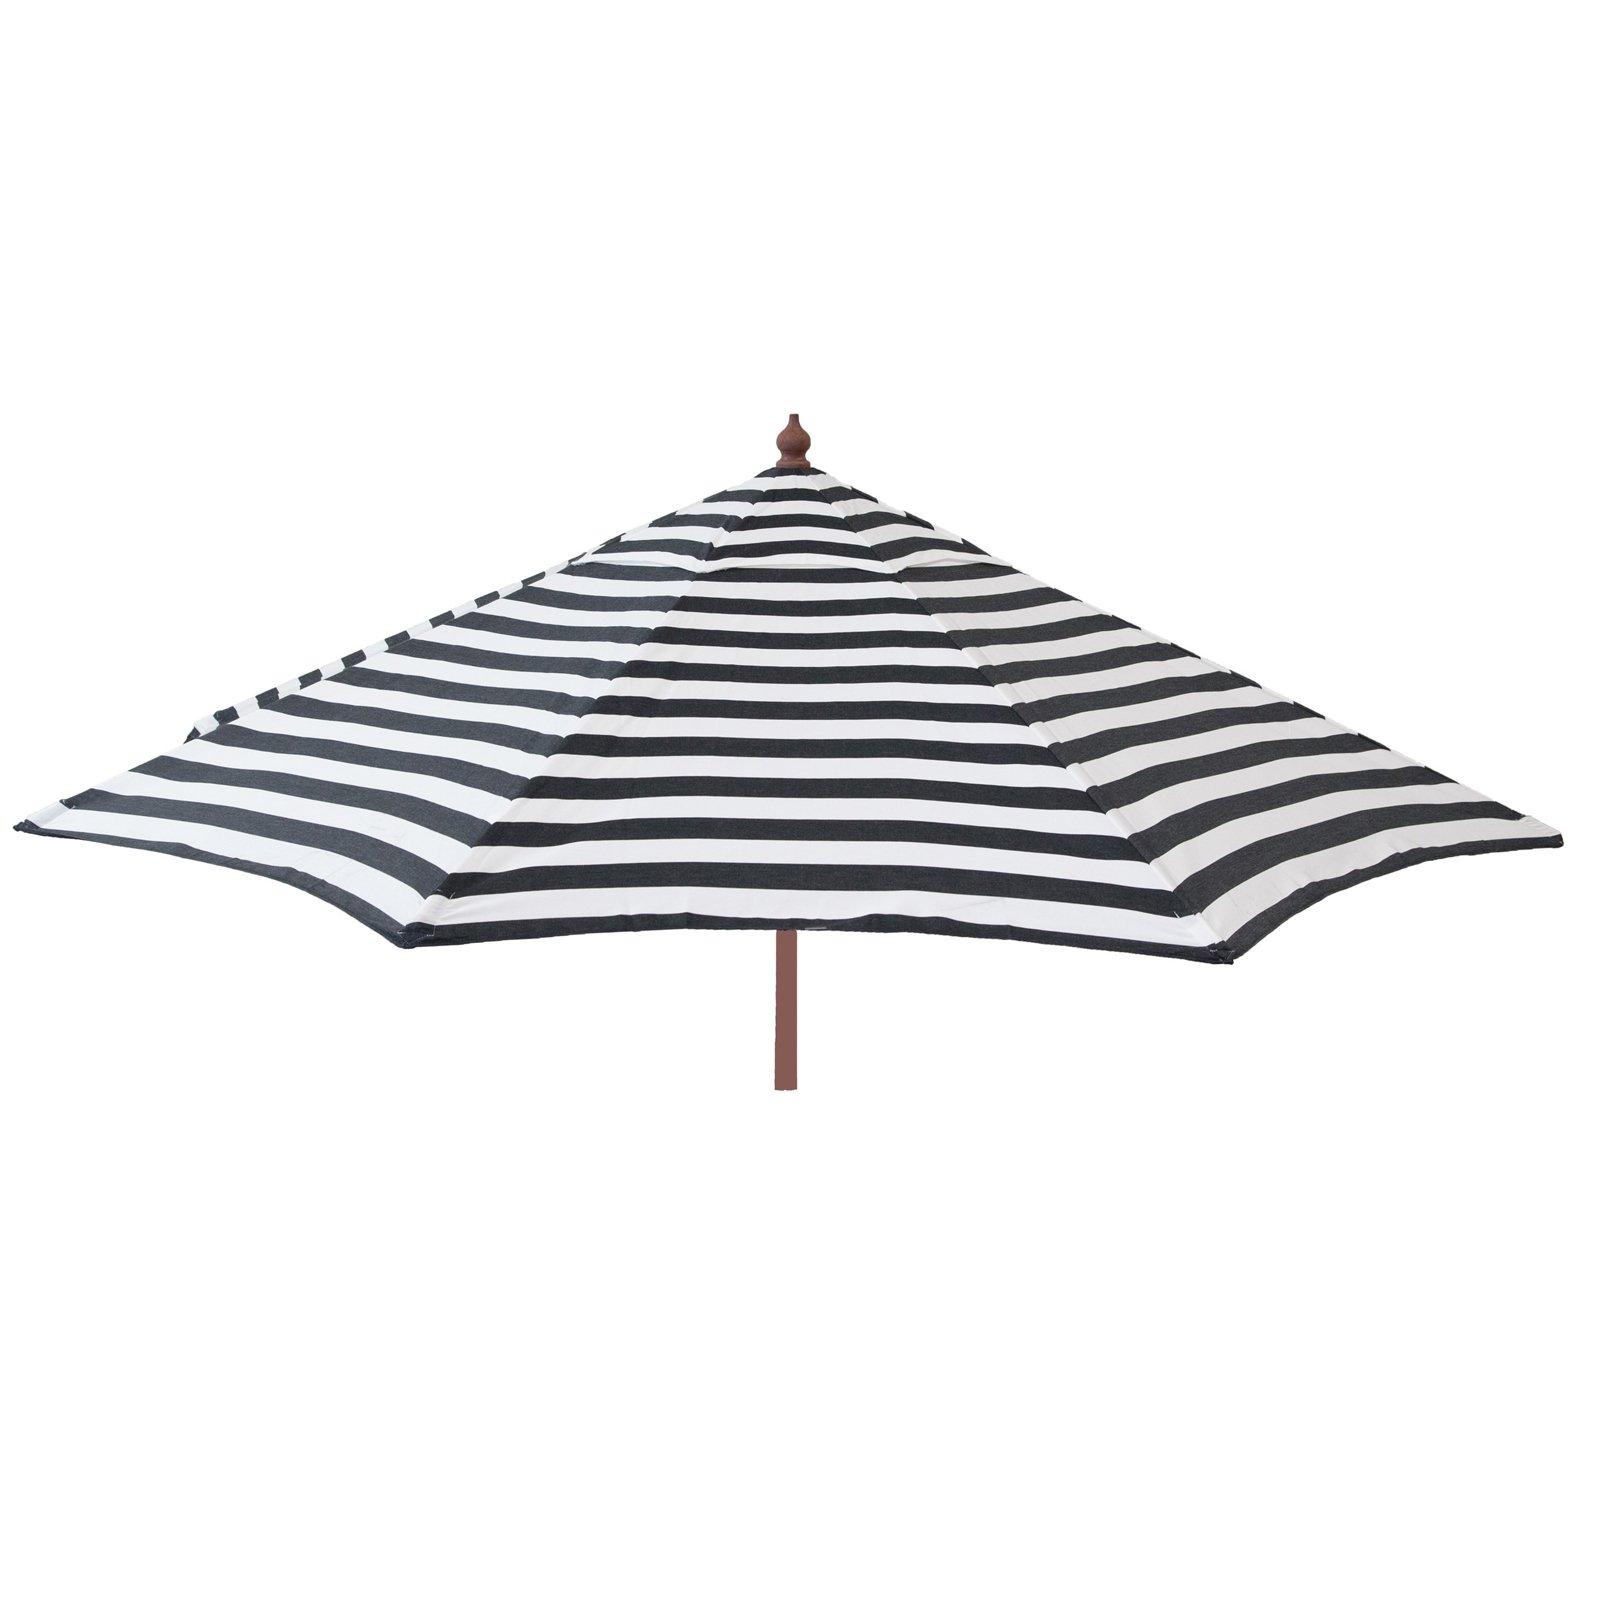 9ft Tilt Italian Market Umbrella Home Patio Canopy Sun Shelter - Black and White